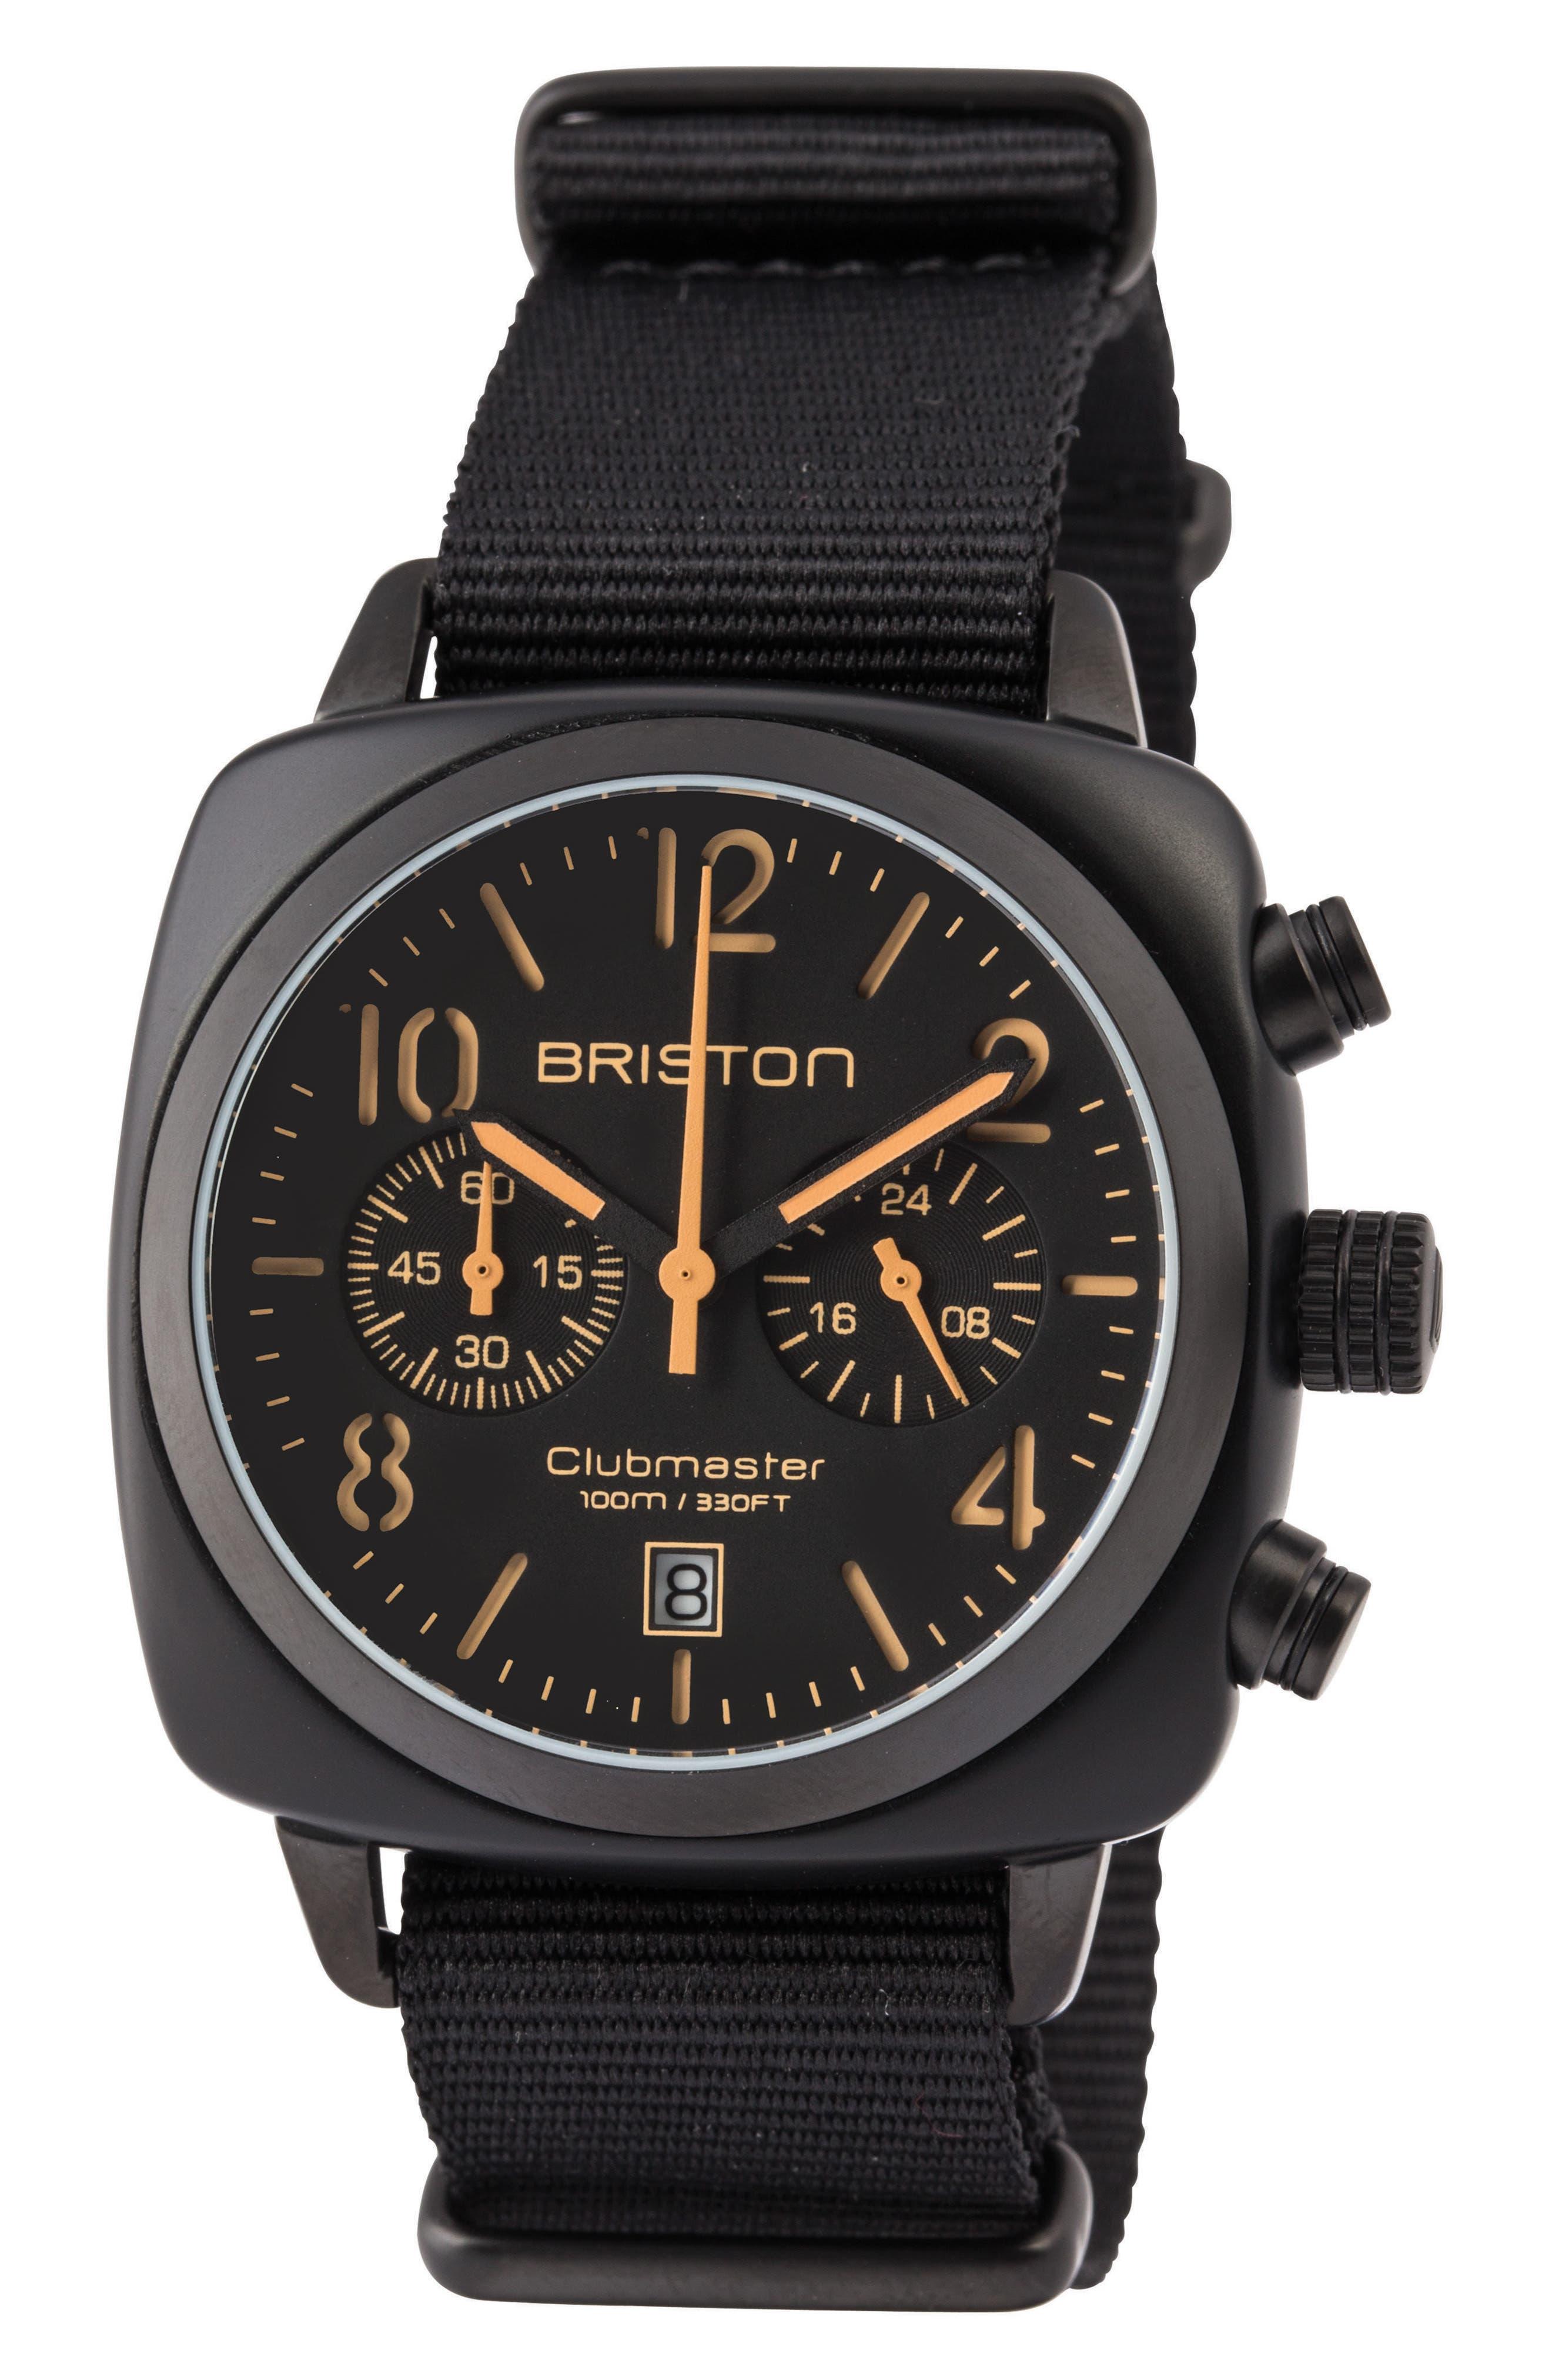 Main Image - Briston Watches Clubmaster Classic Chronograph Nylon Strap Watch, 40mm